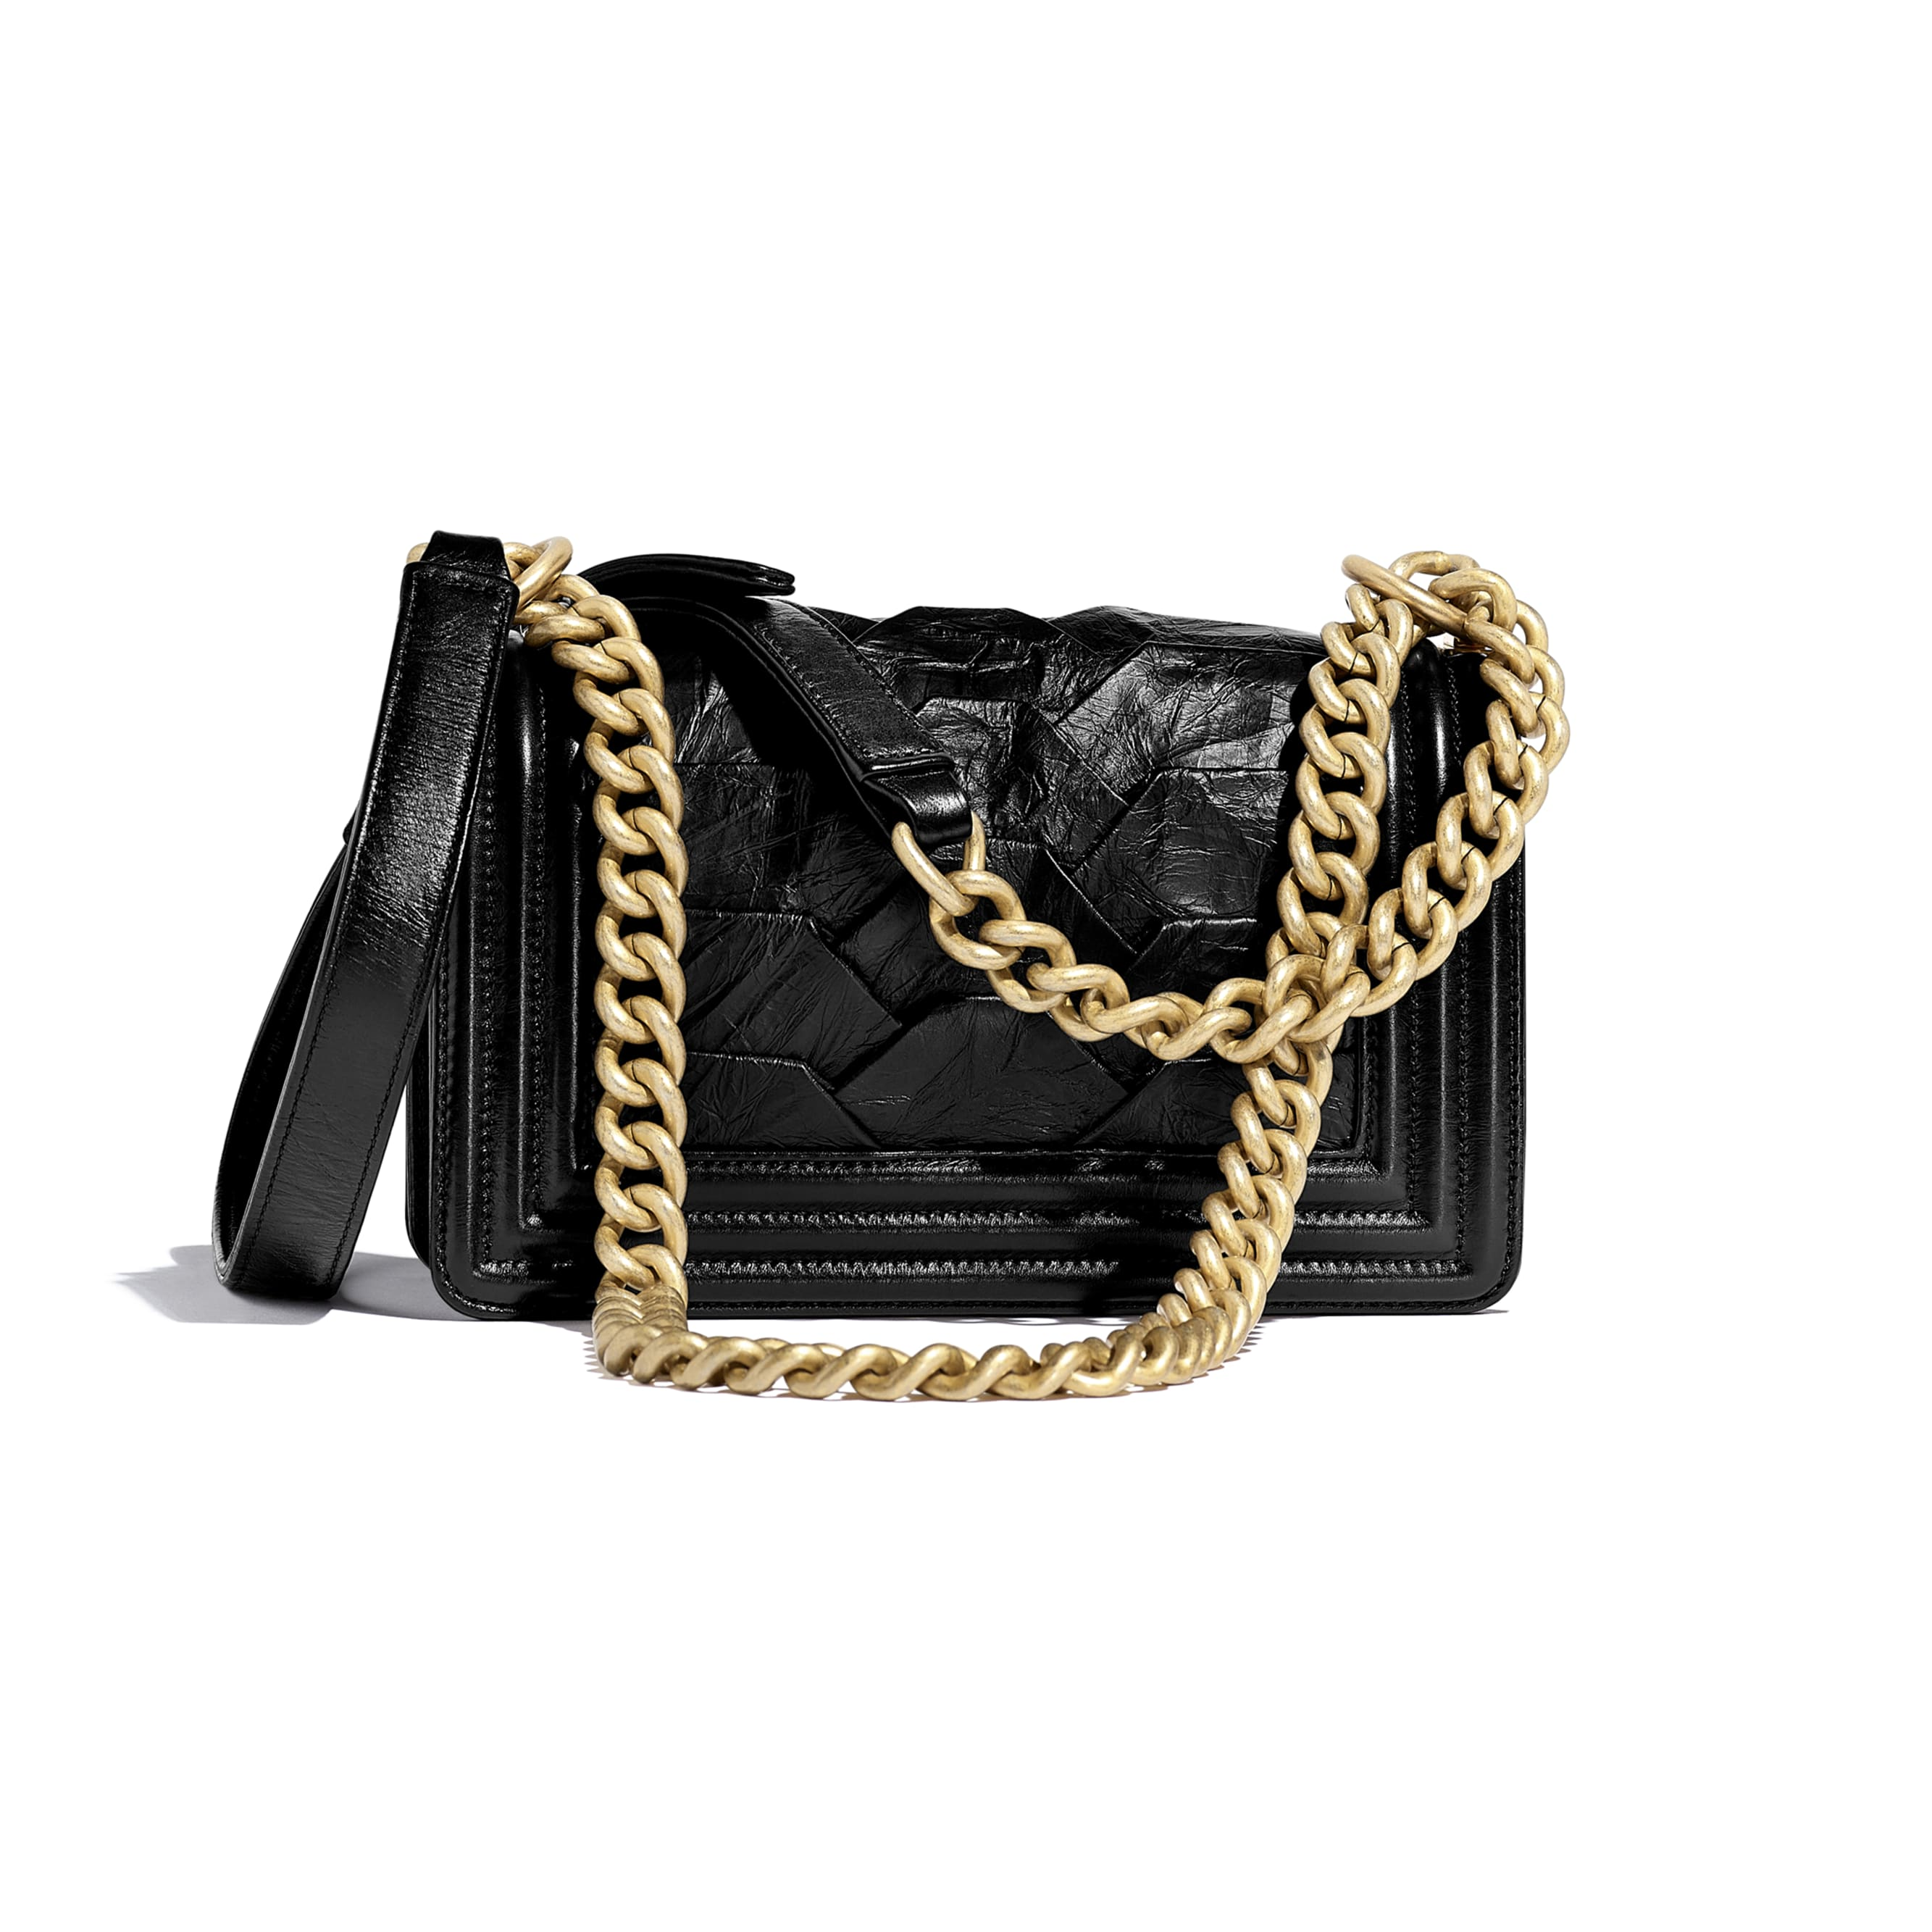 Small BOY CHANEL Handbag - Black - Crumpled Calfskin & Gold-Tone Metal - Alternative view - see standard sized version